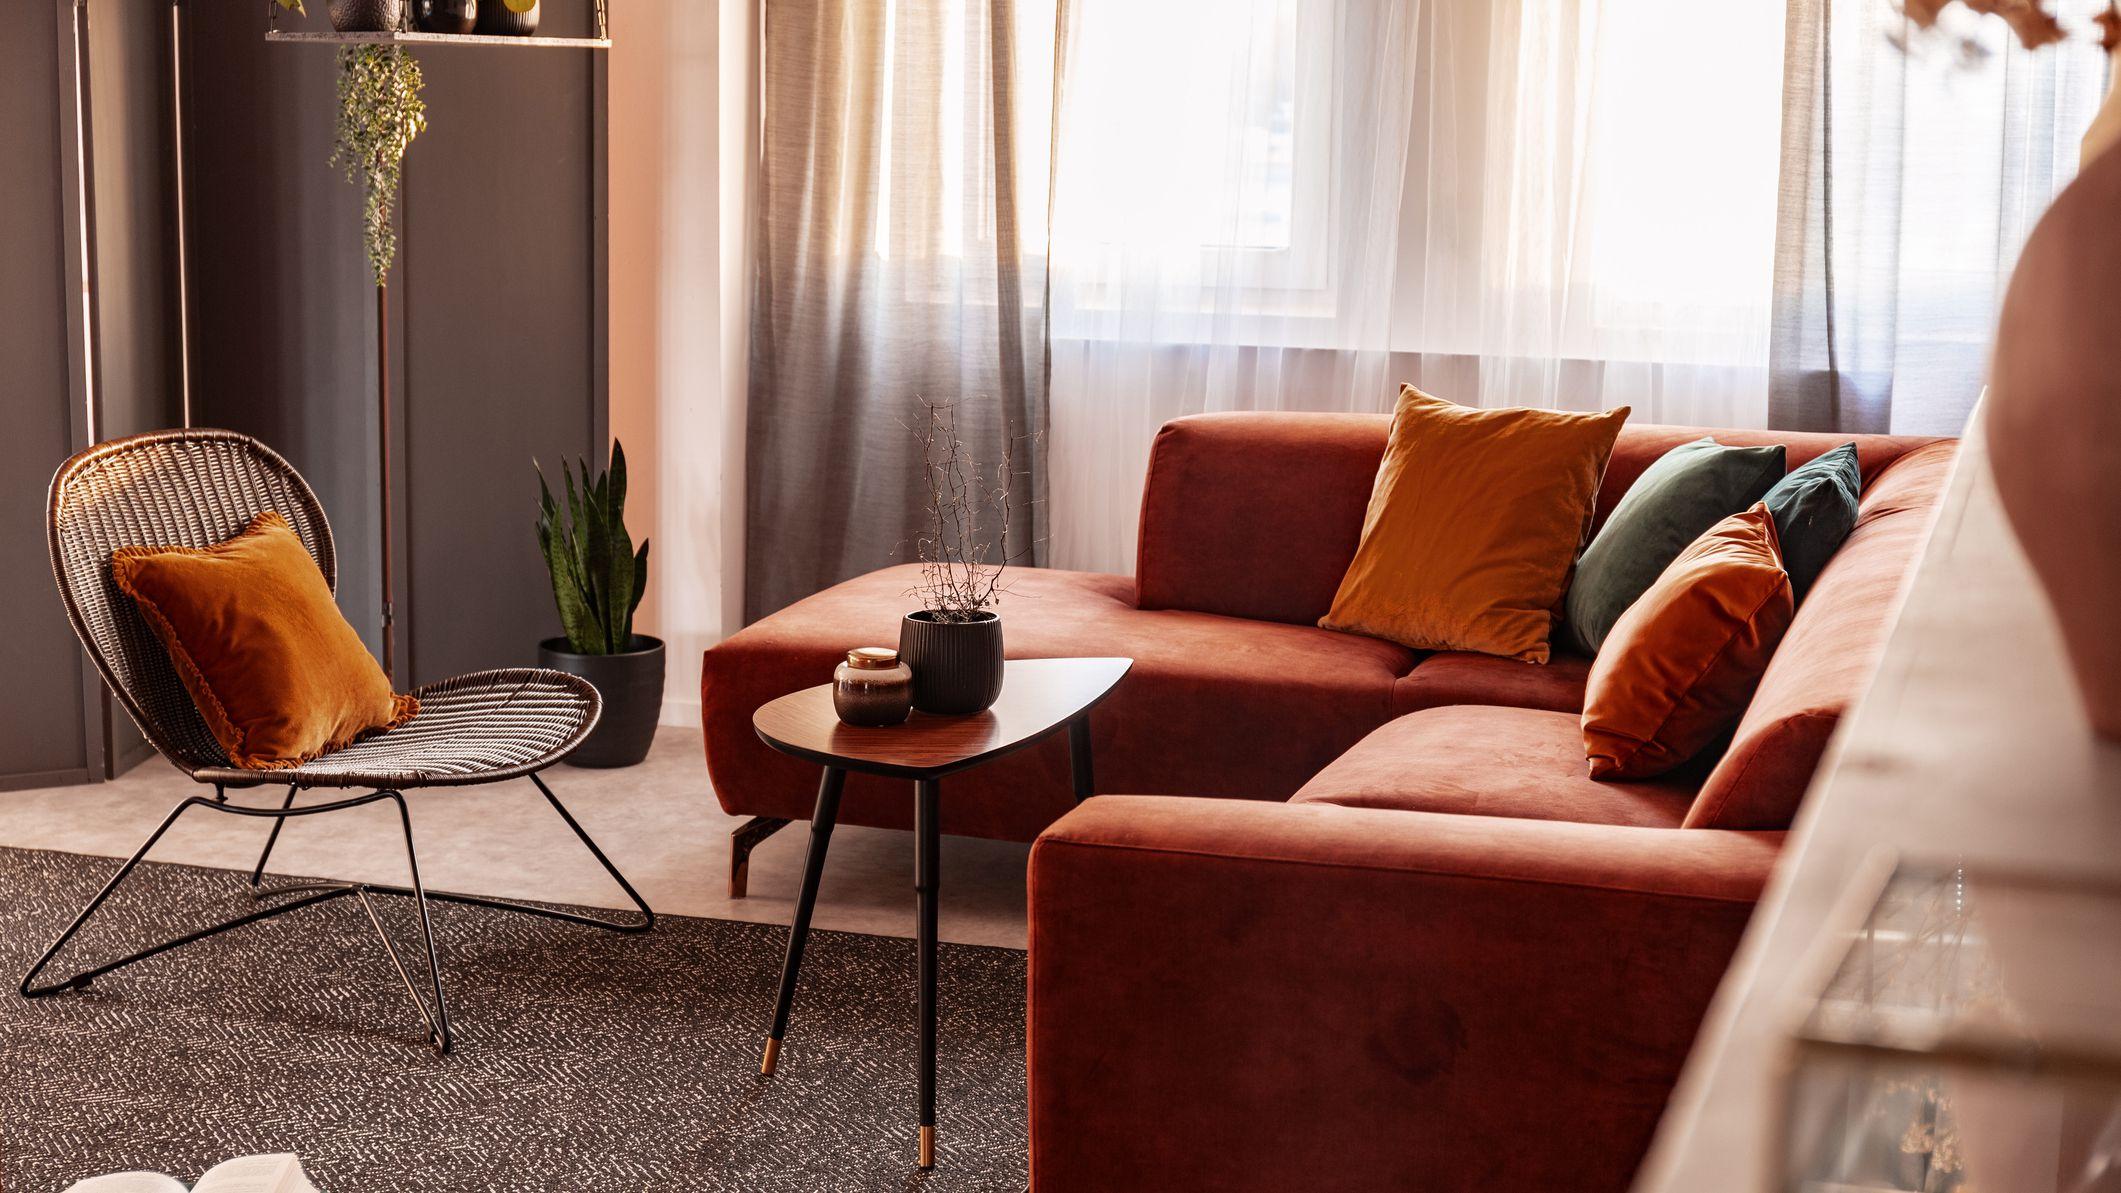 Sofa Untuk Ruang Tamu Kecil Minimalis